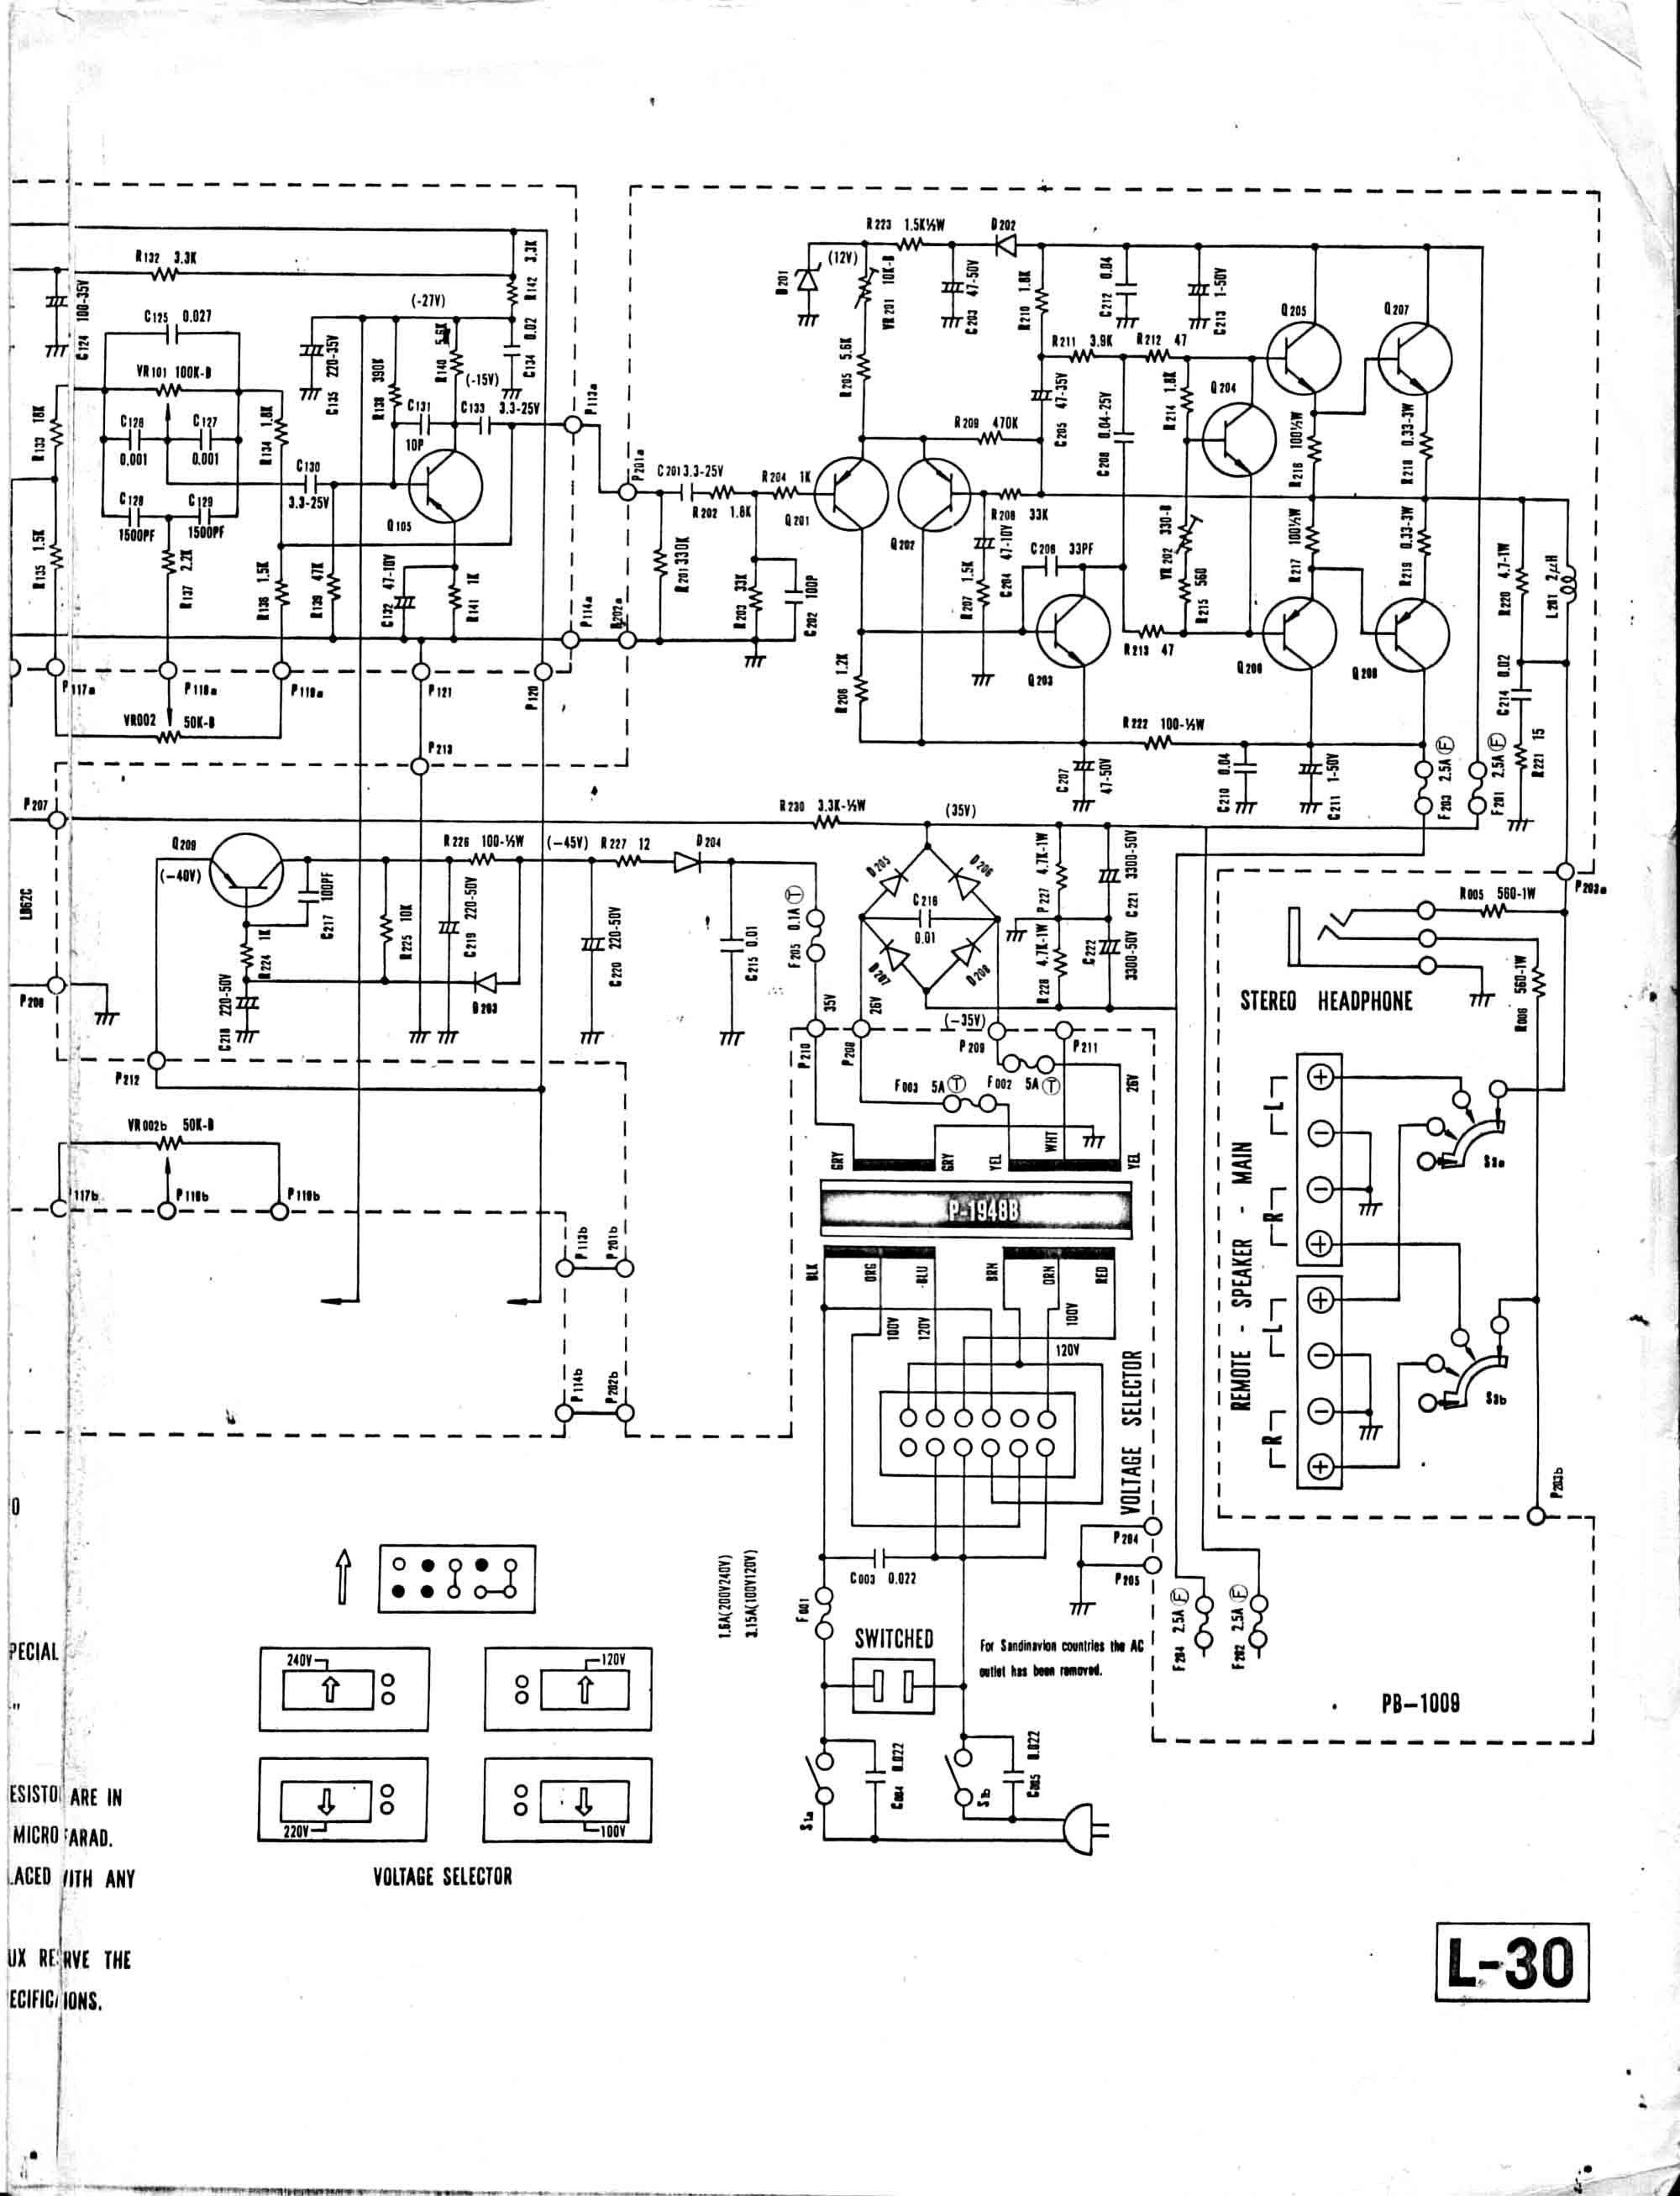 Esquema el trico inje o efi fic leco pinterest text file onkyo wiring diagram esquema el trico inje o efi fic leco pinterest text file